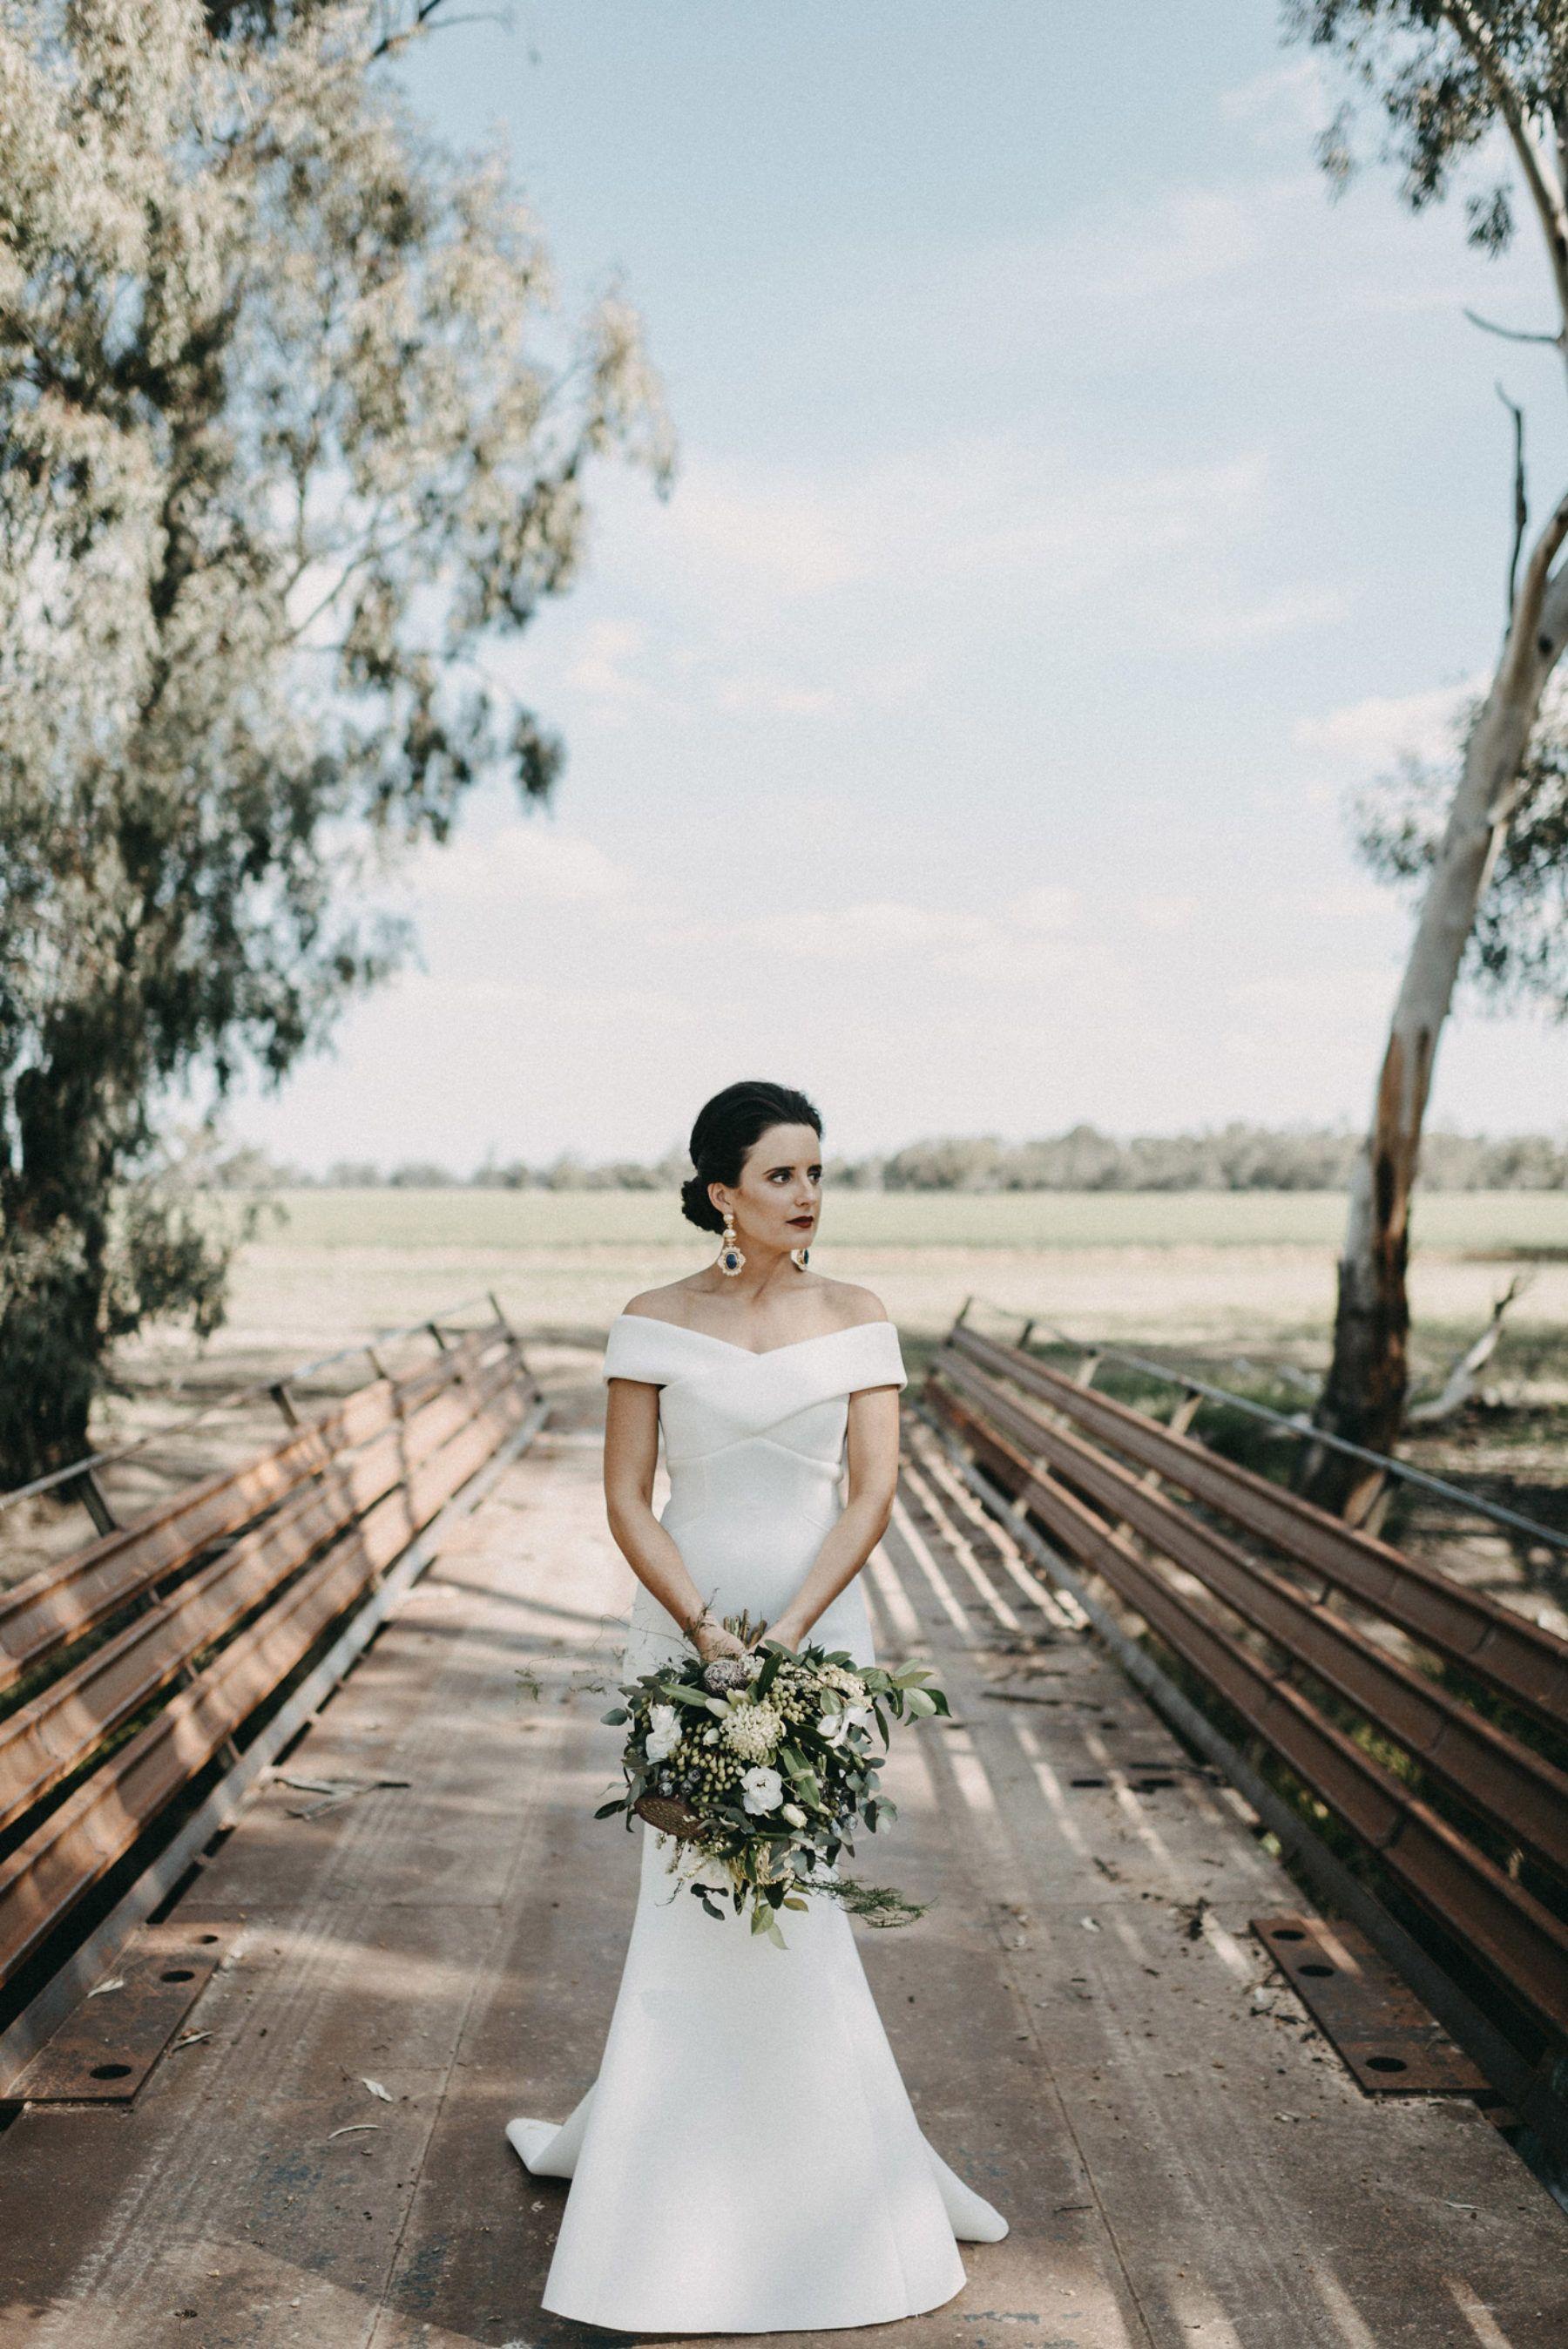 Jaclyn u danielus glam country wedding in a machinery shed rachel